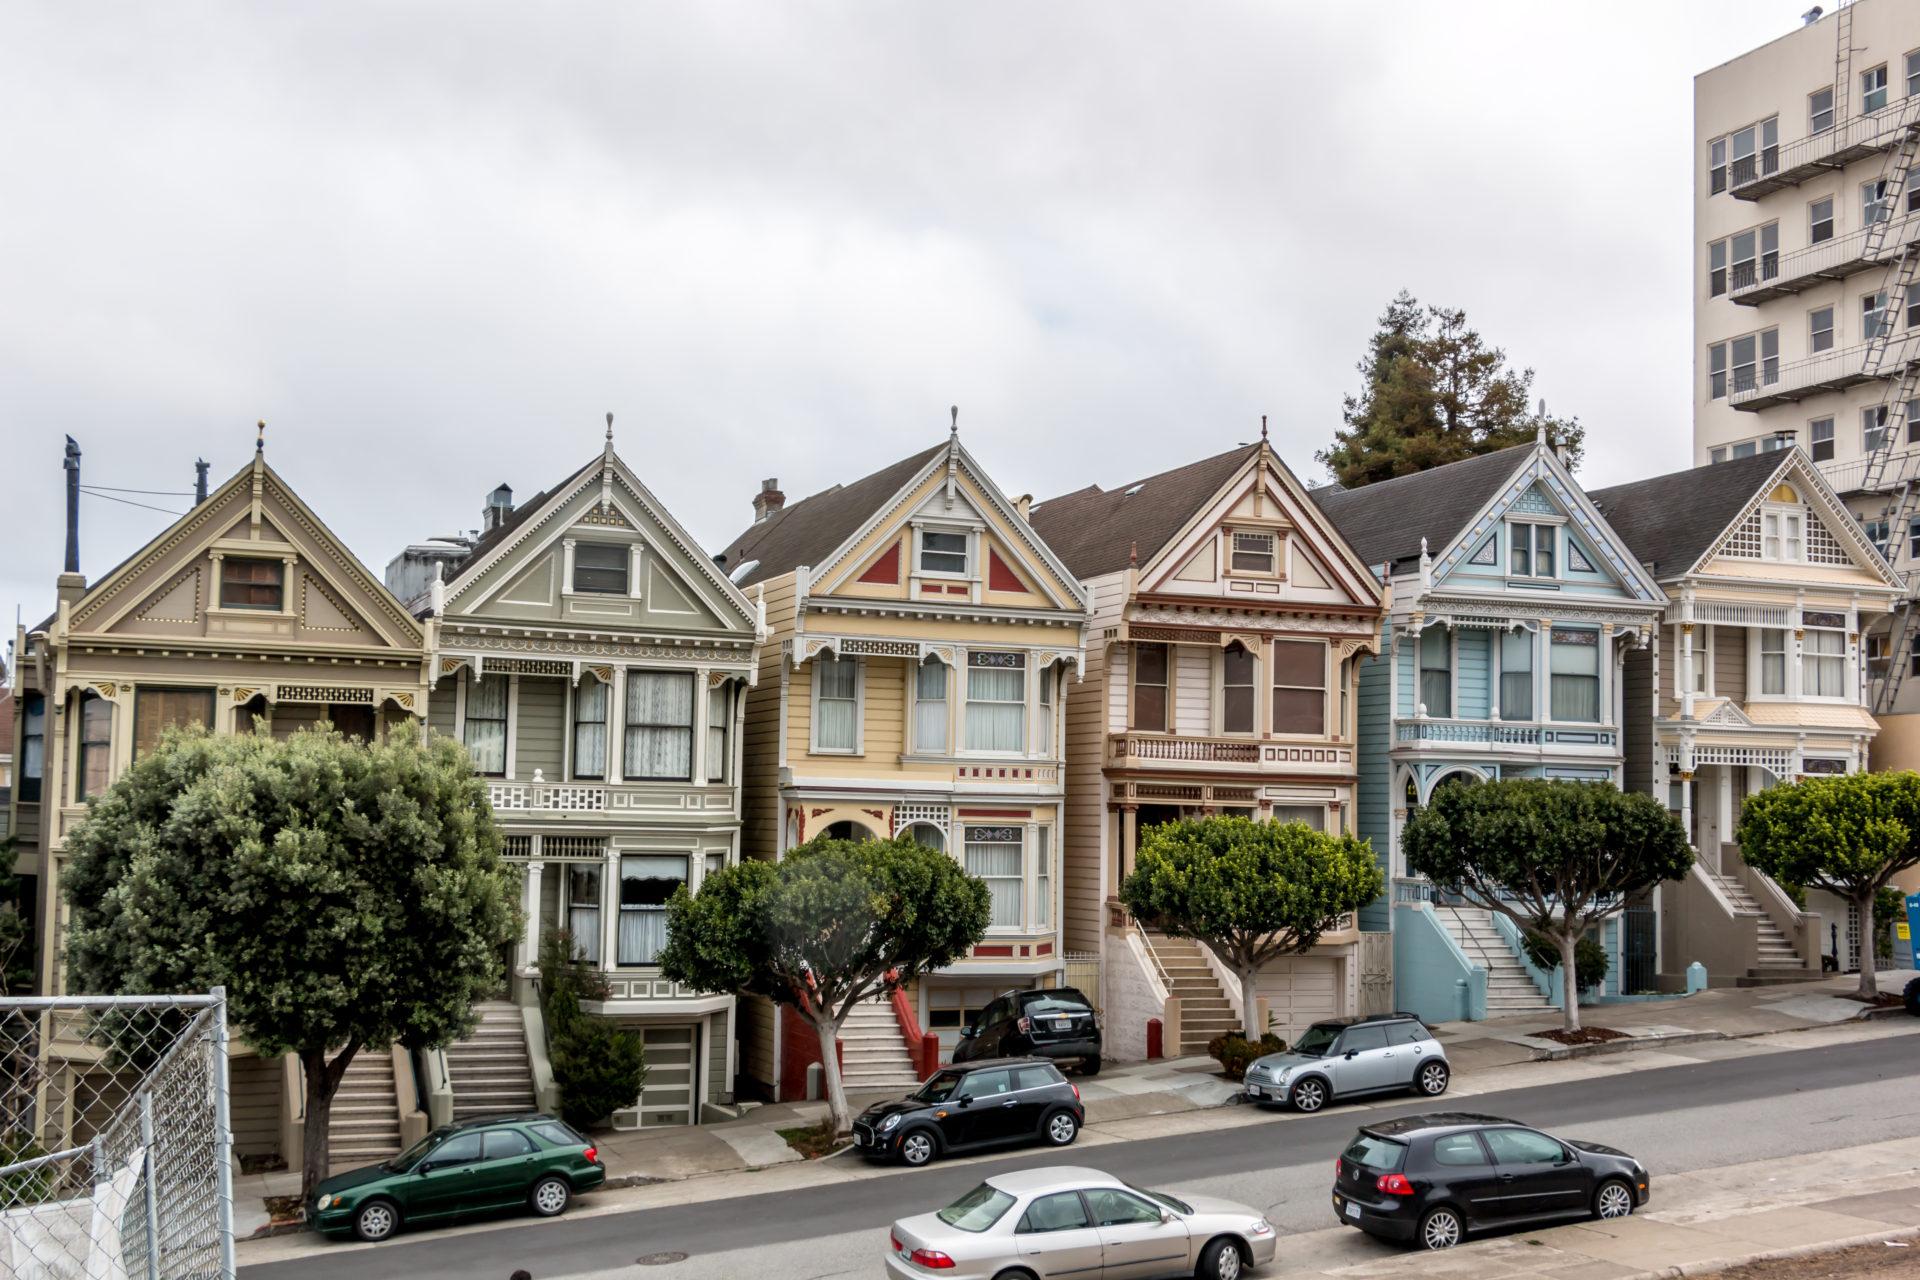 "<i class=""fa fa-film""></i>– San Francisco par Twin Peaks et les 6 Painted Ladies"